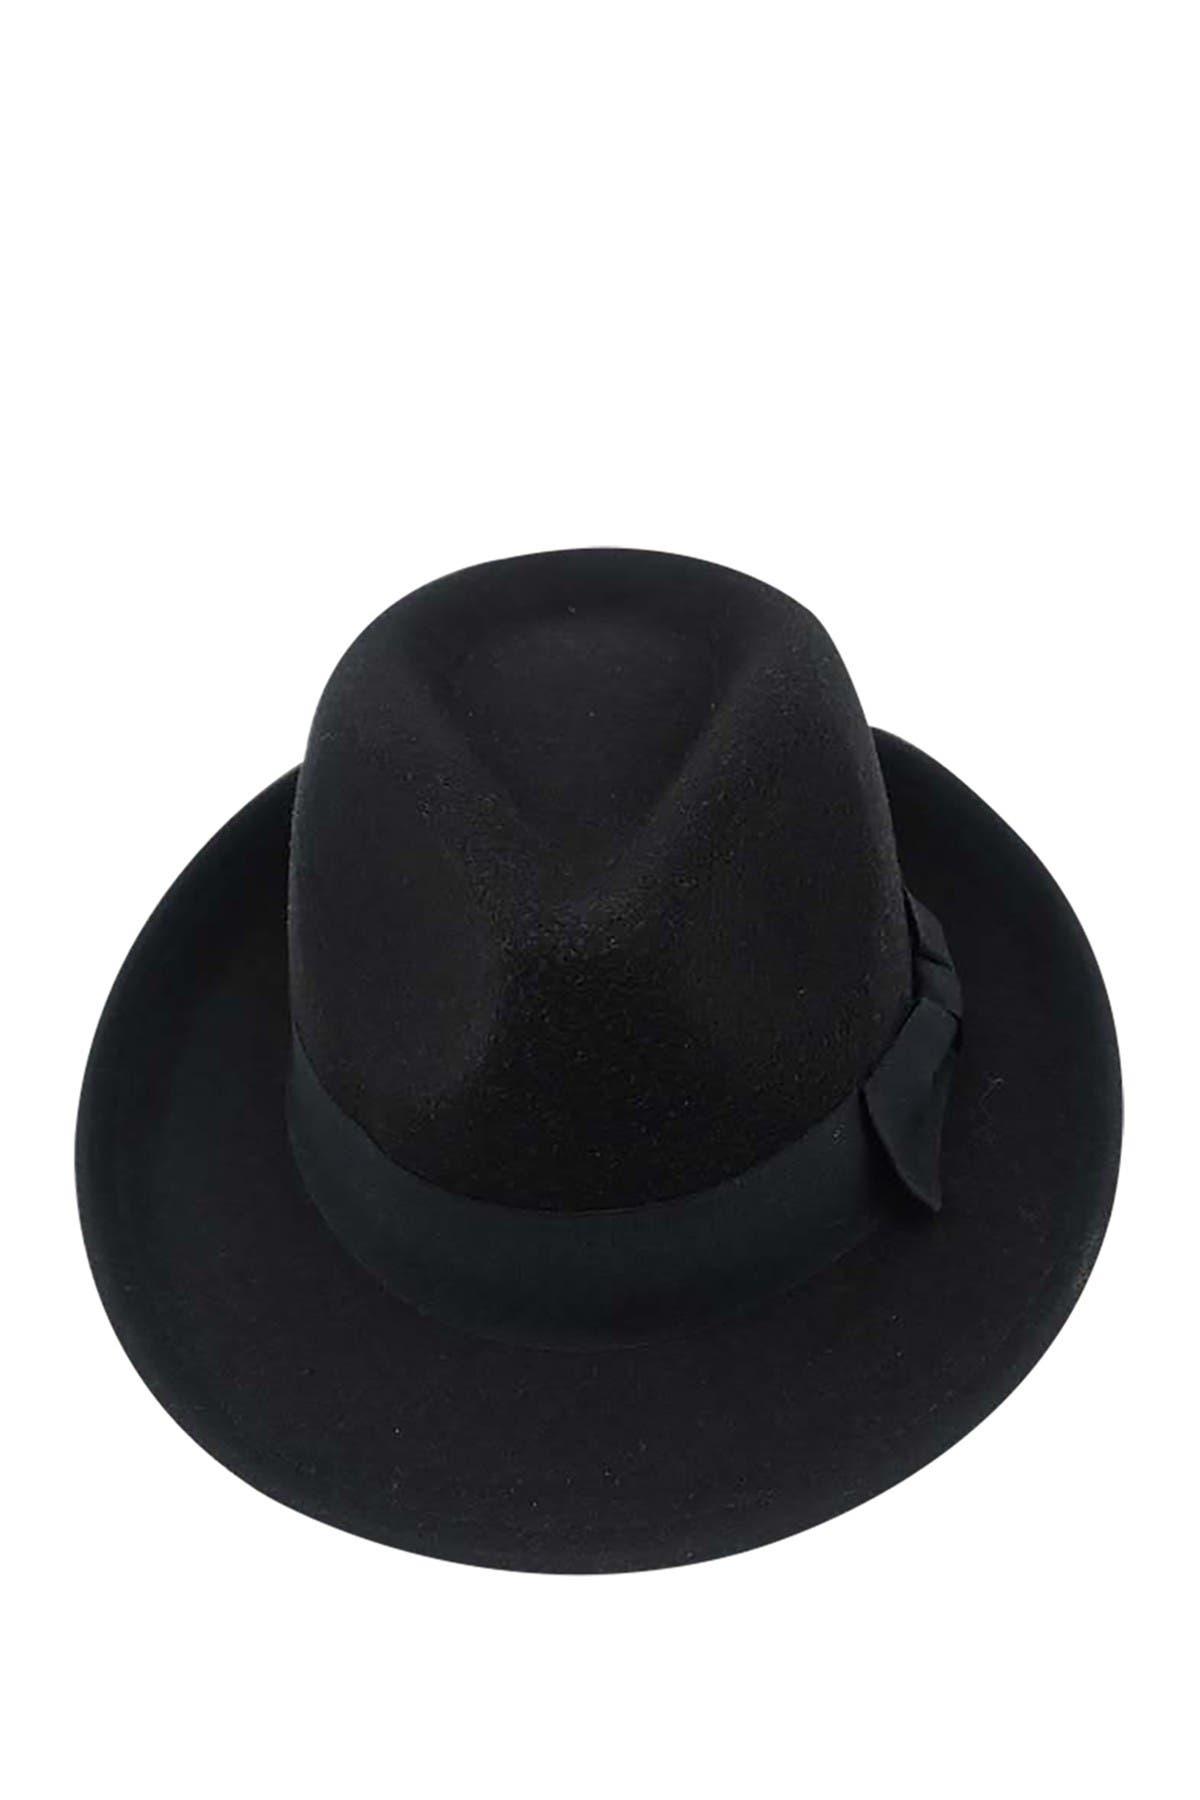 Image of Peter Grimm Headwear Bugsy Felt Fedora